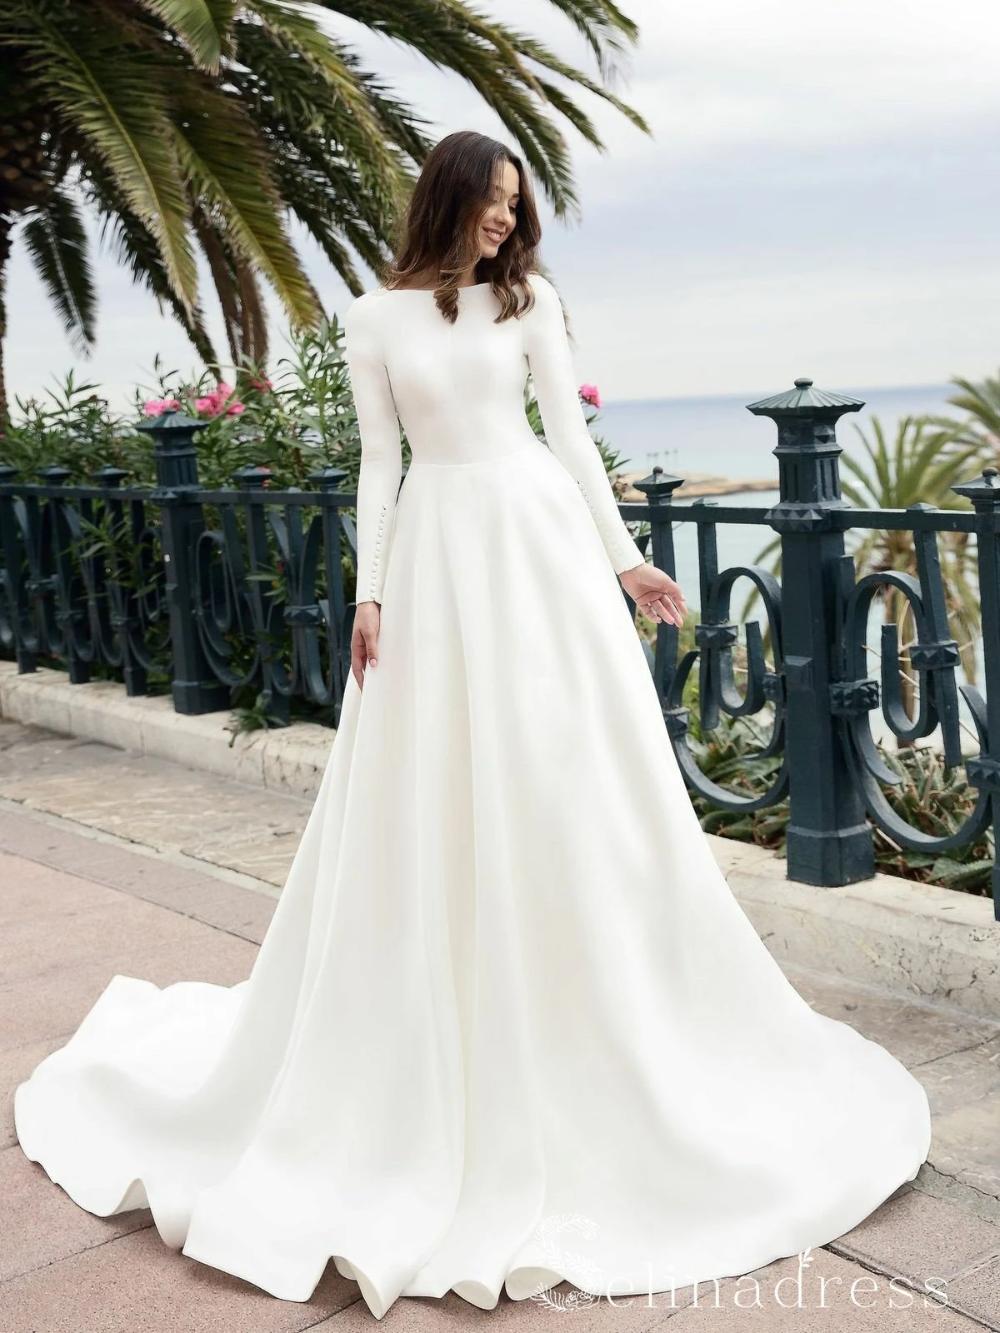 A Line Long Sleeve Backless Wedding Dresses White Satin Princess Wedding Dress Sew058 In 2021 Wedding Dresses Satin Modest Wedding Dresses Wedding Gown Simple [ 1333 x 1000 Pixel ]